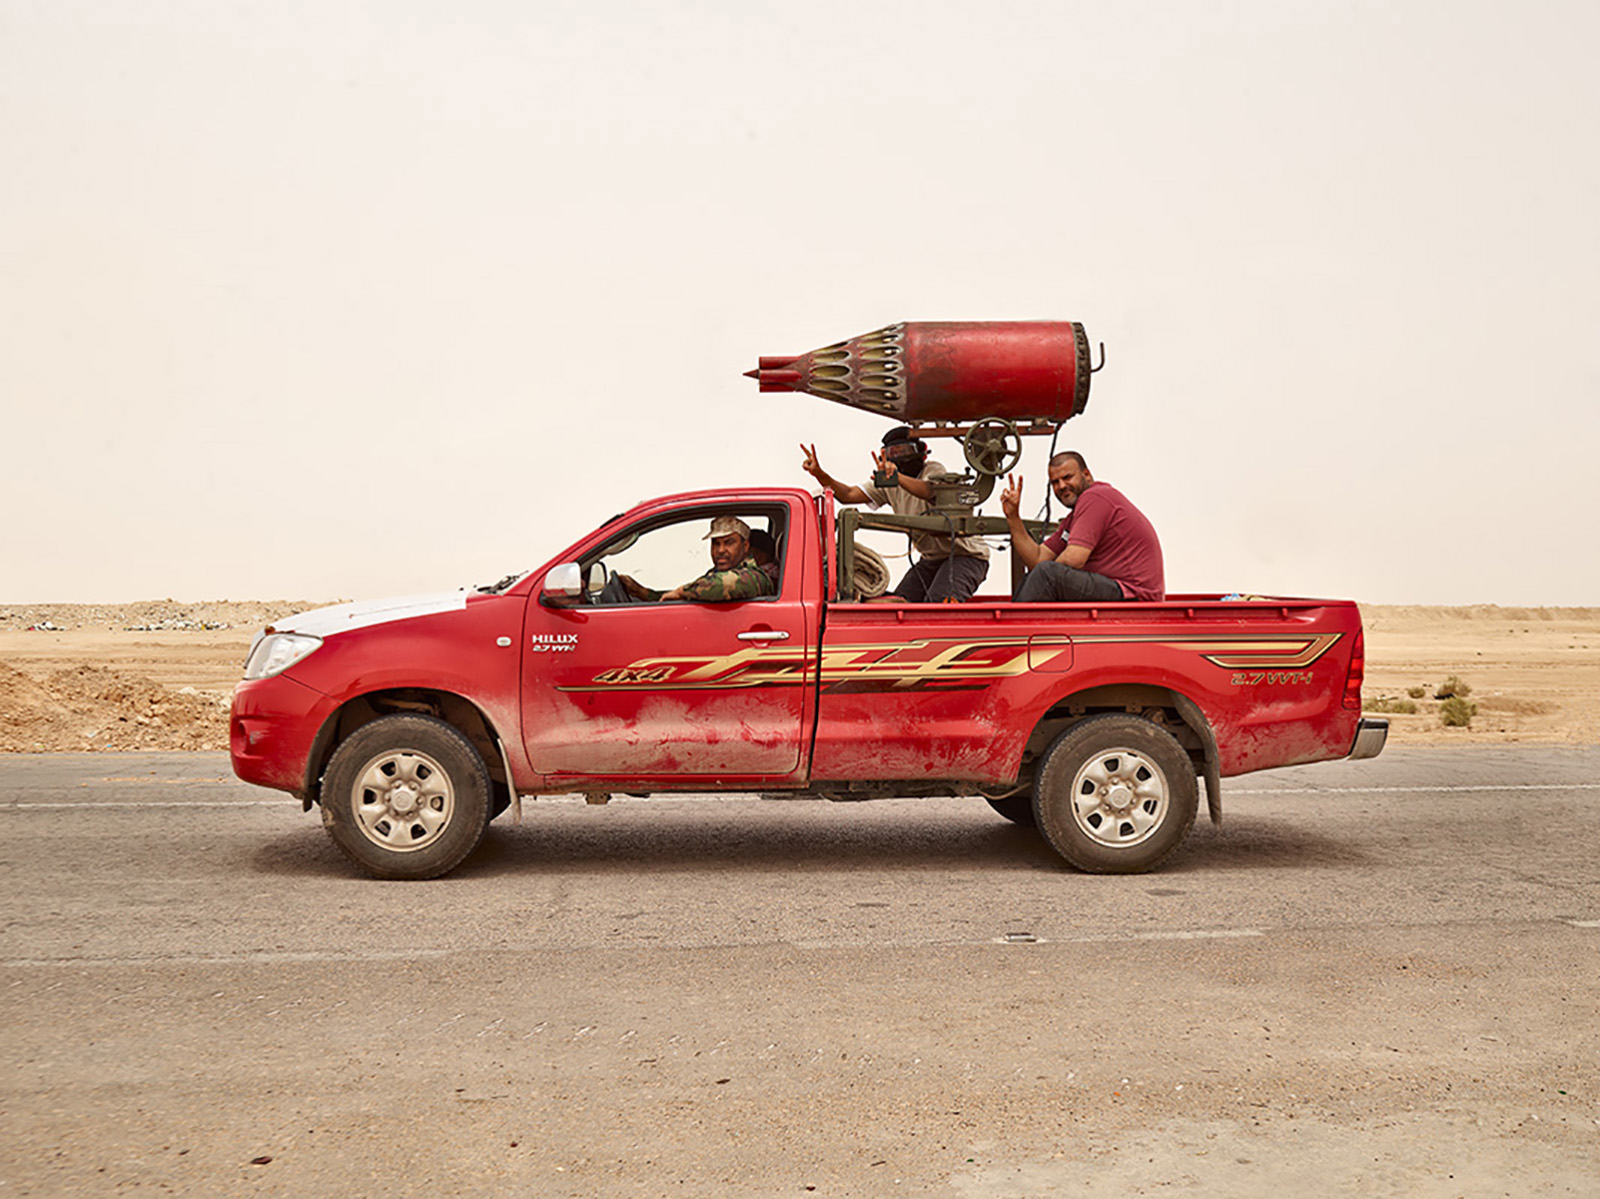 James-Mollison-Libya-Battle-Trucks-feat.jpg